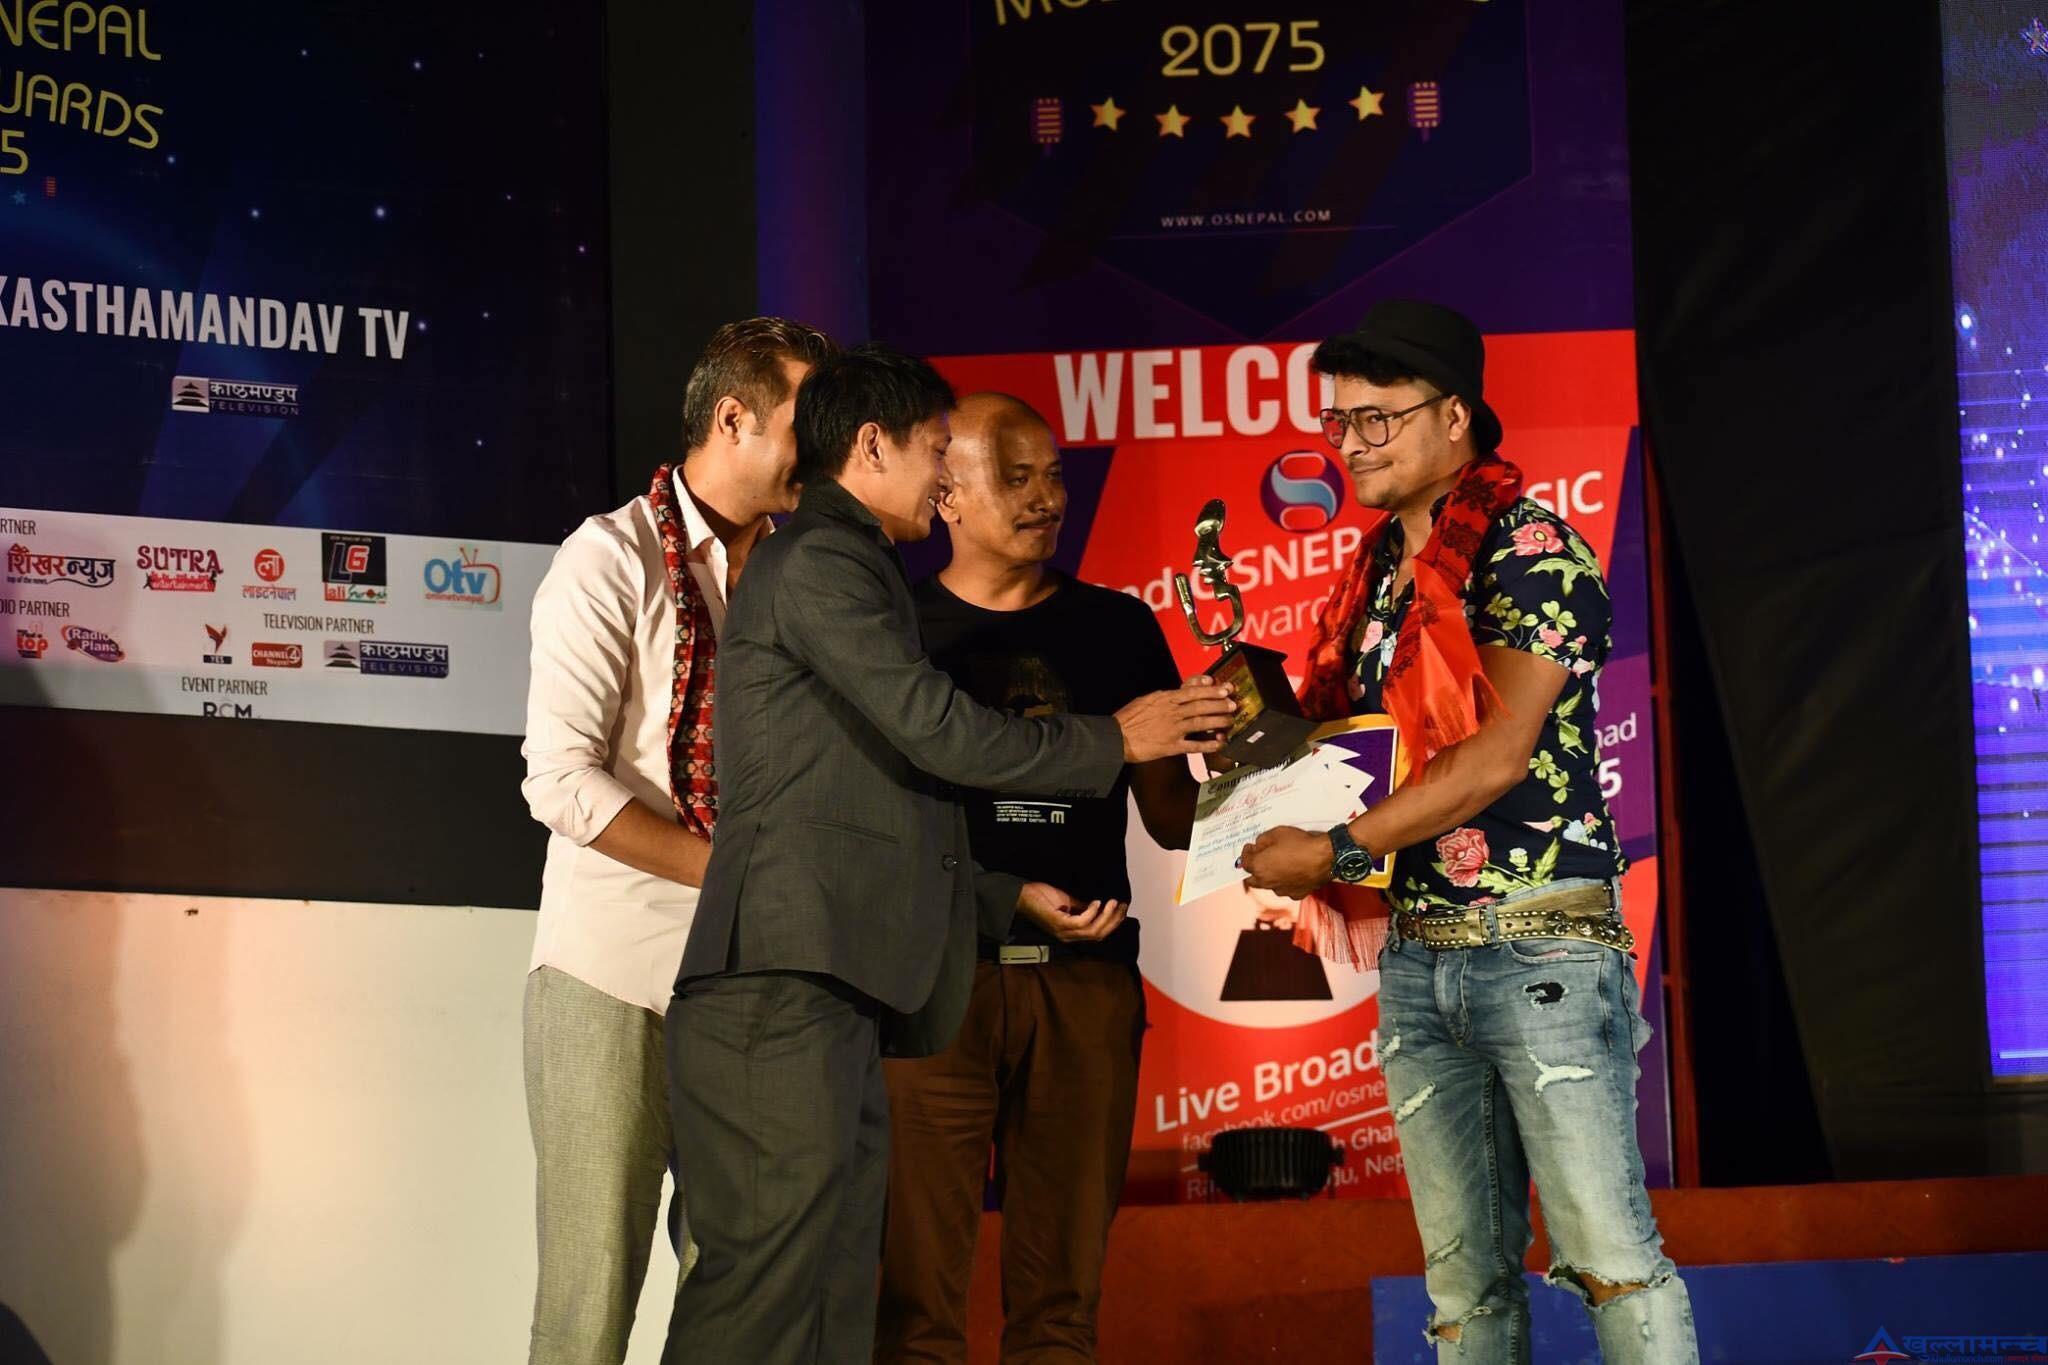 ओएस नेपाल म्युजिक अवार्ड, पृथ्बी राज प्रसाईं पुरुषतर्फ बेस्ट पप मोडल विजेता